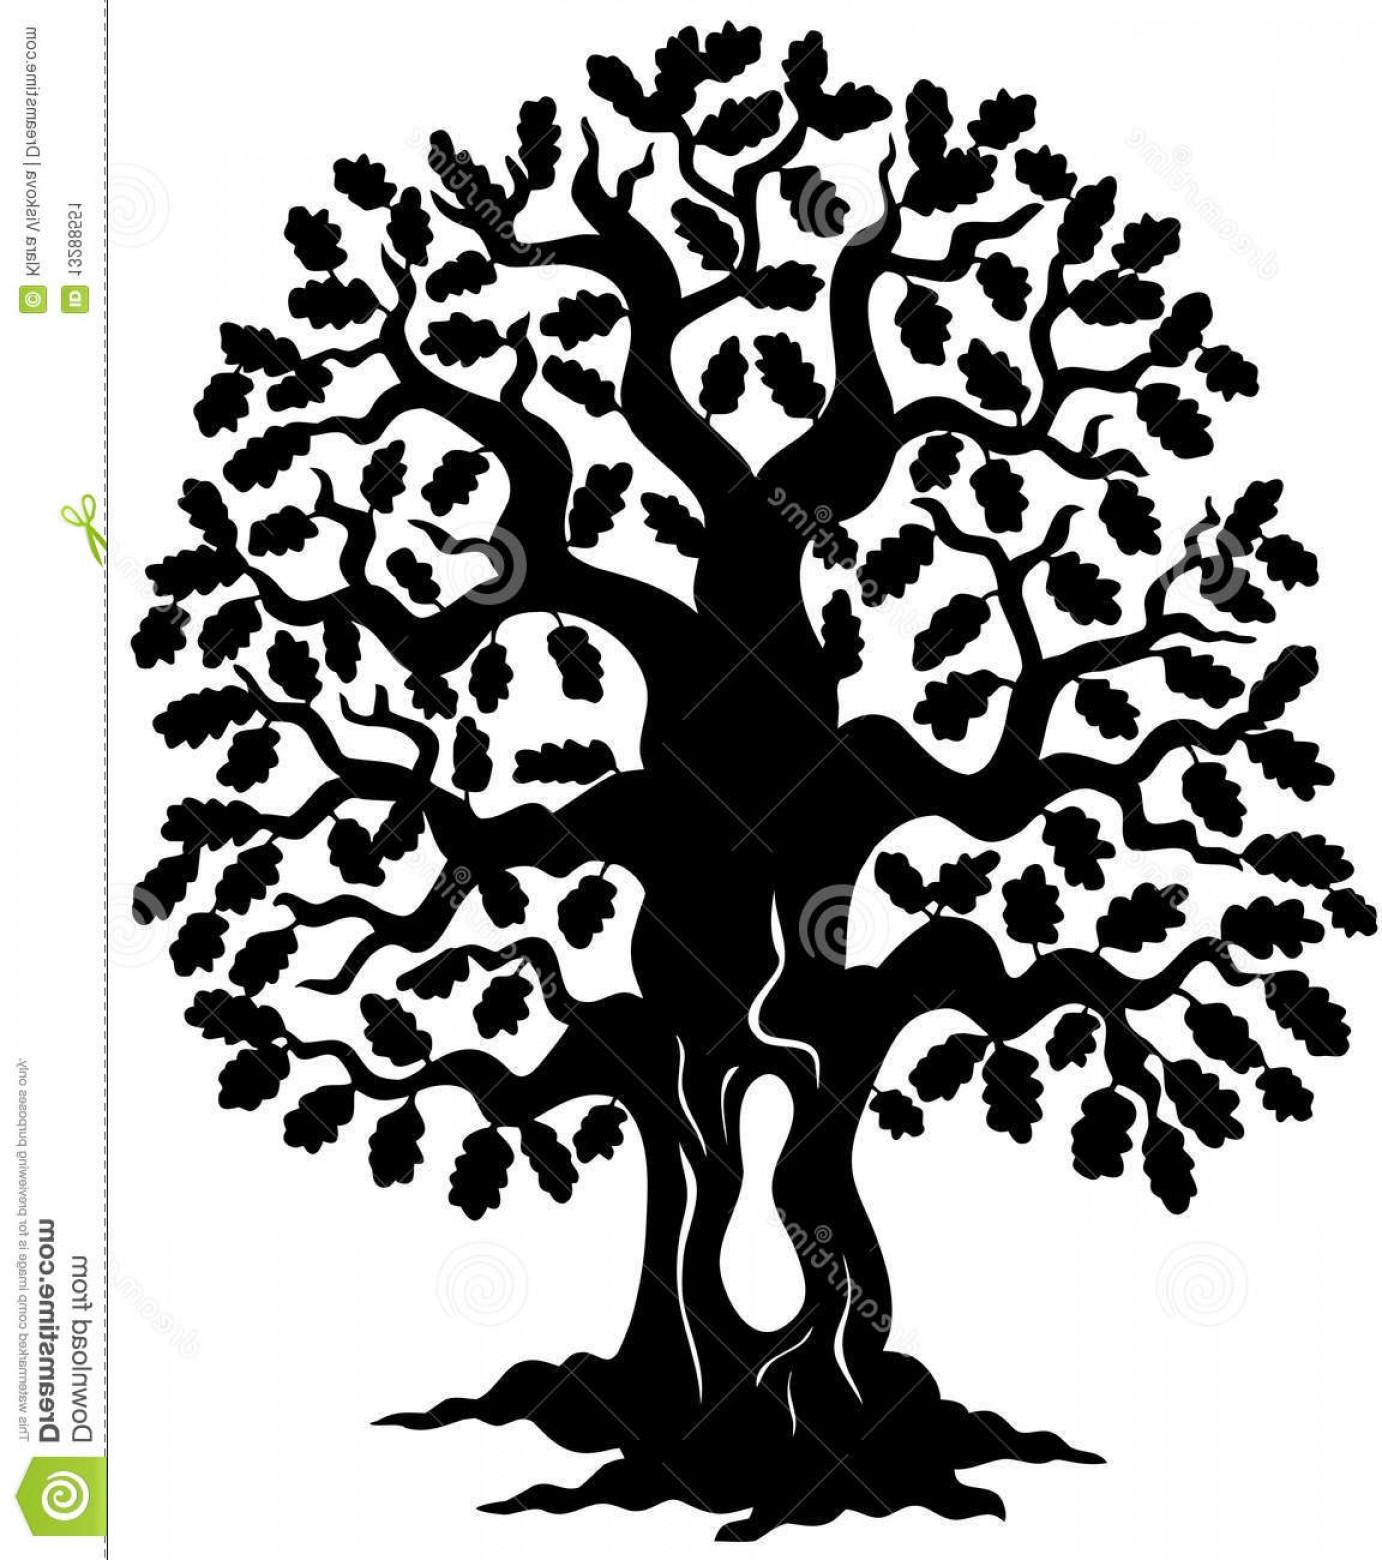 1382x1560 Stock Image Oak Tree Silhouette Image Createmepink